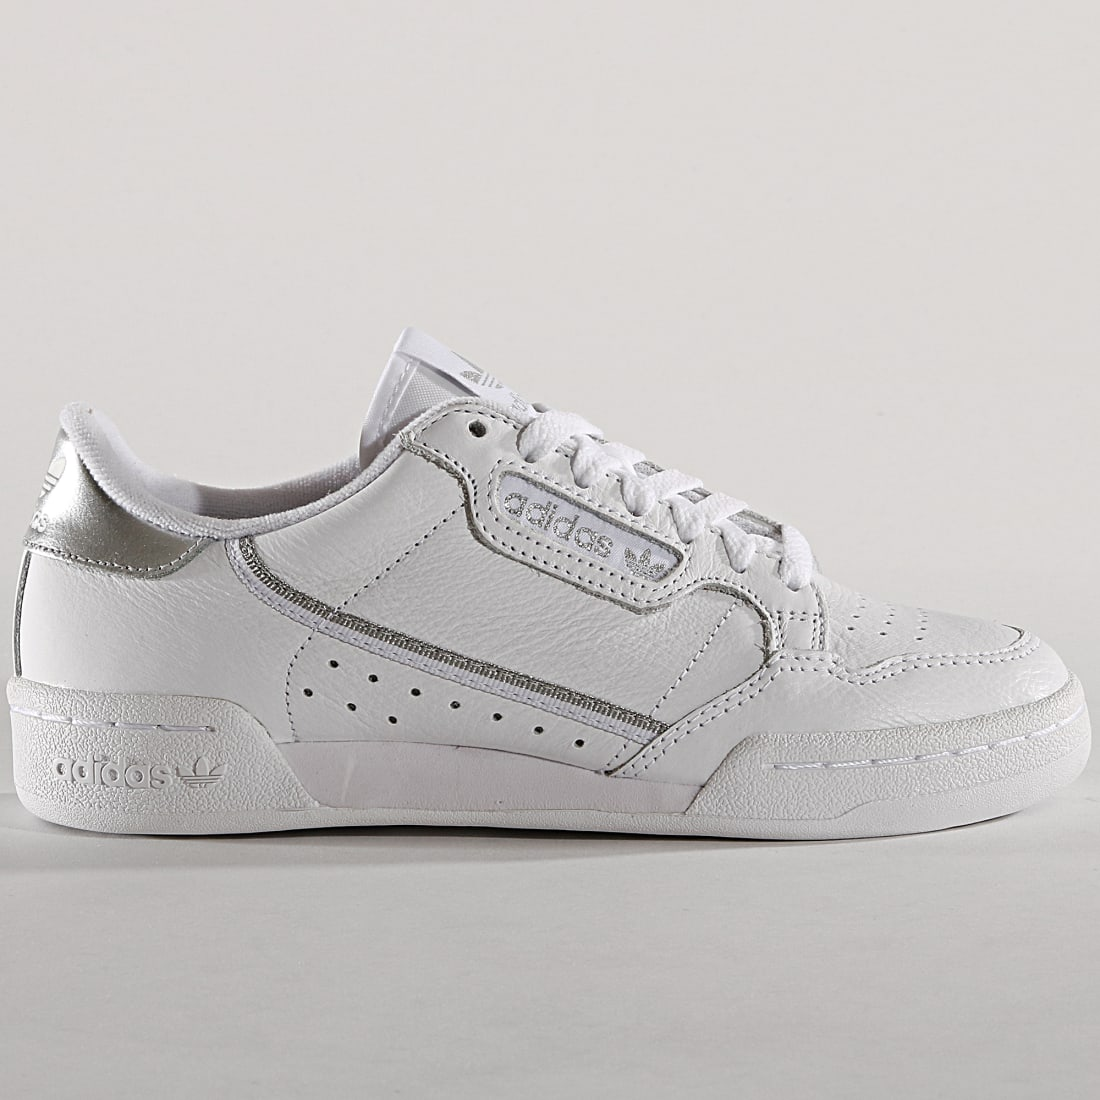 adidas Baskets Continental 80 EE8925 Footwear White Silver